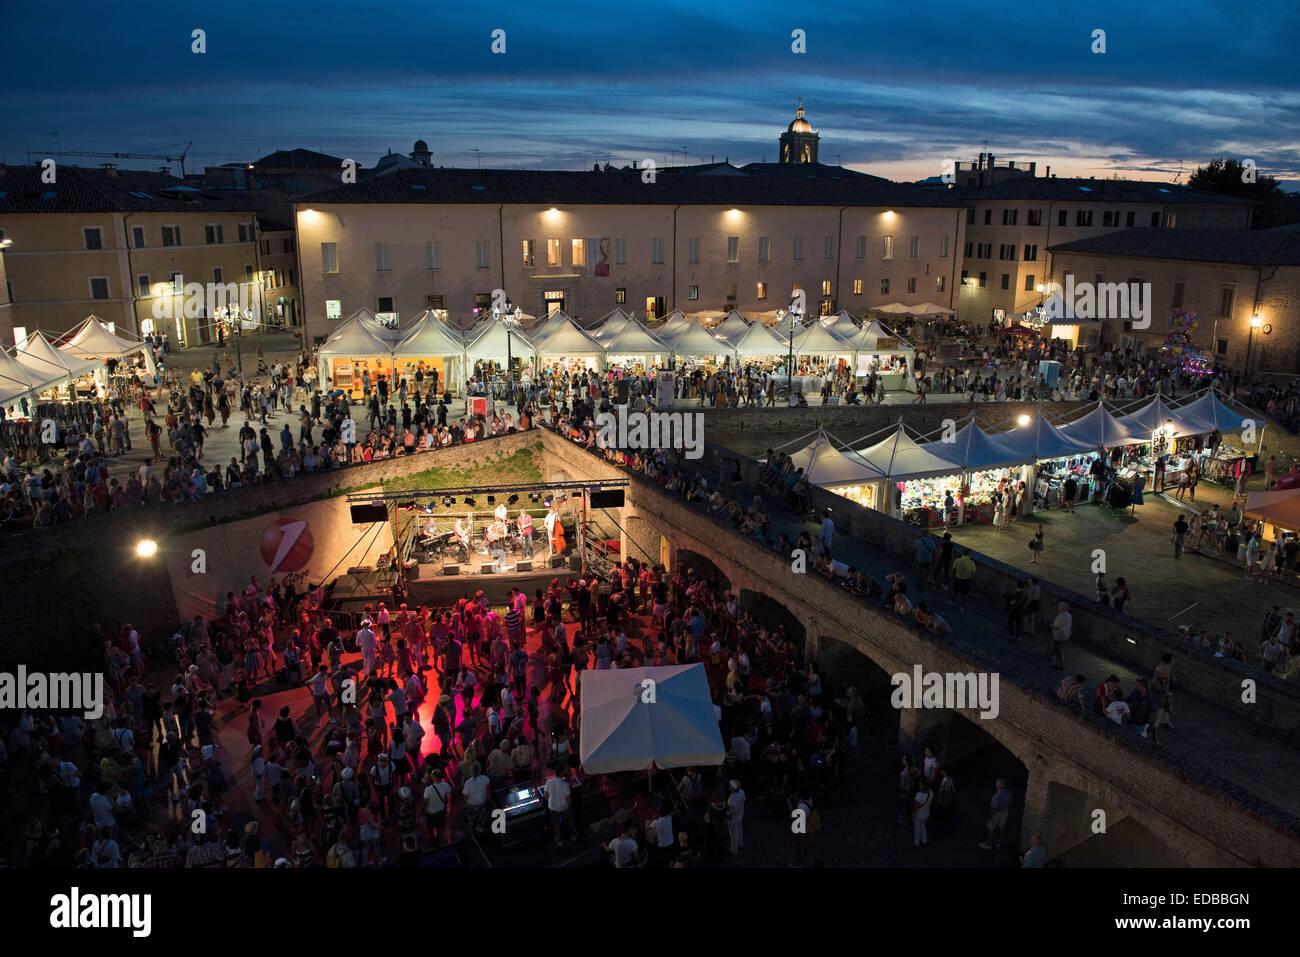 Summer Jamboree, Rock'n'Roll Festival, Rocca Roveresca, Senigallia, Province of Ancona, Marche, Italy - Stock Image